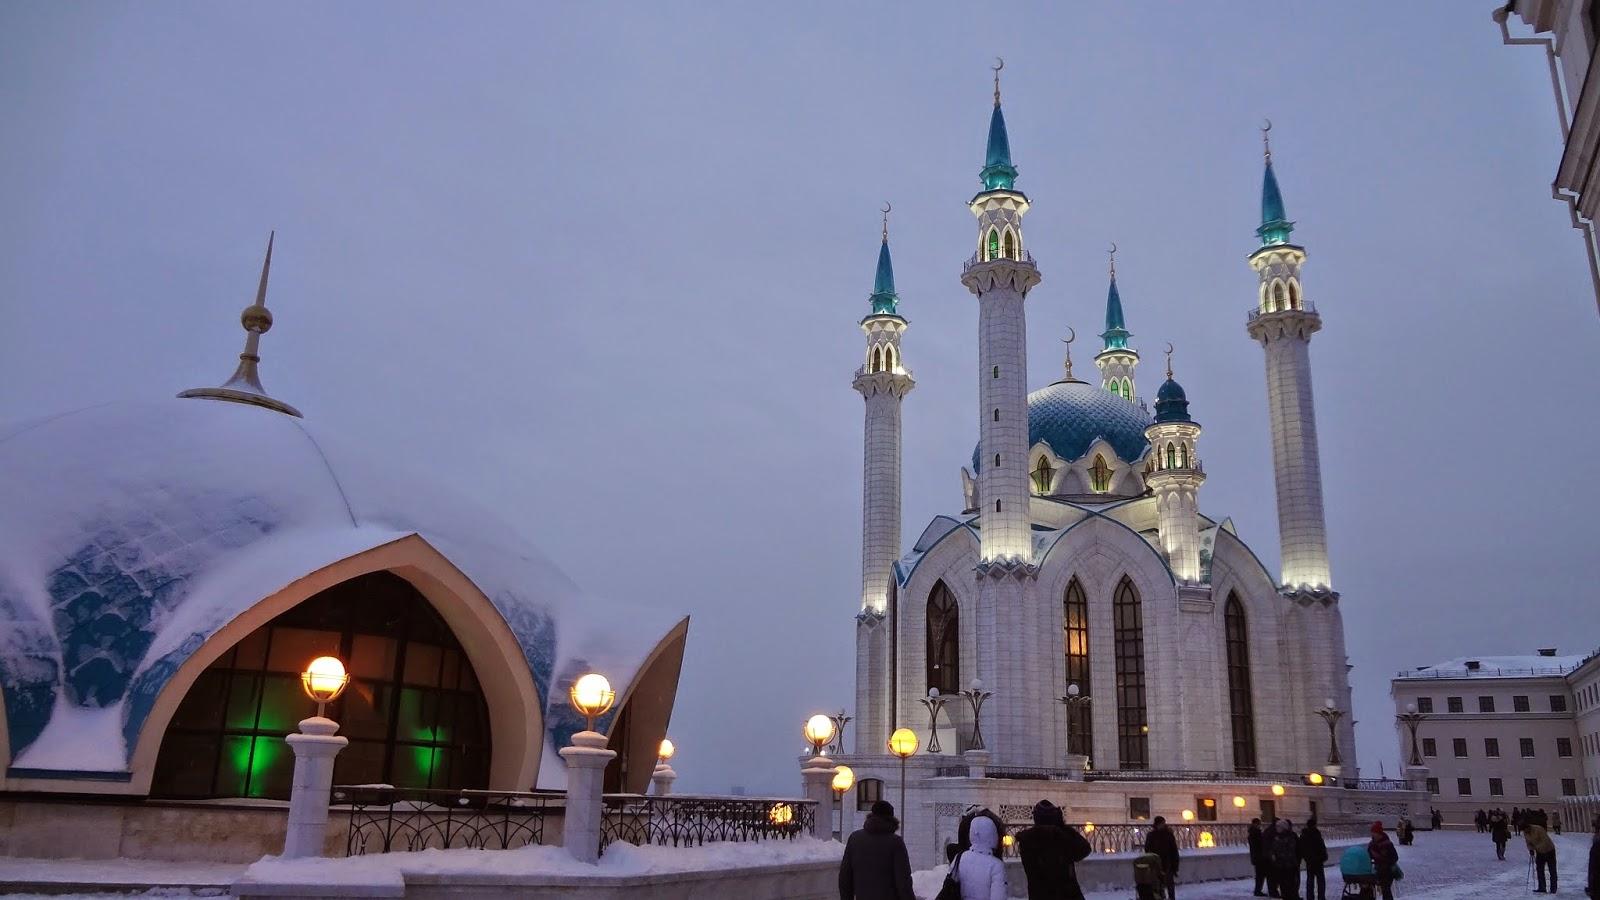 Обои на рабочий стол мечеть кул шариф